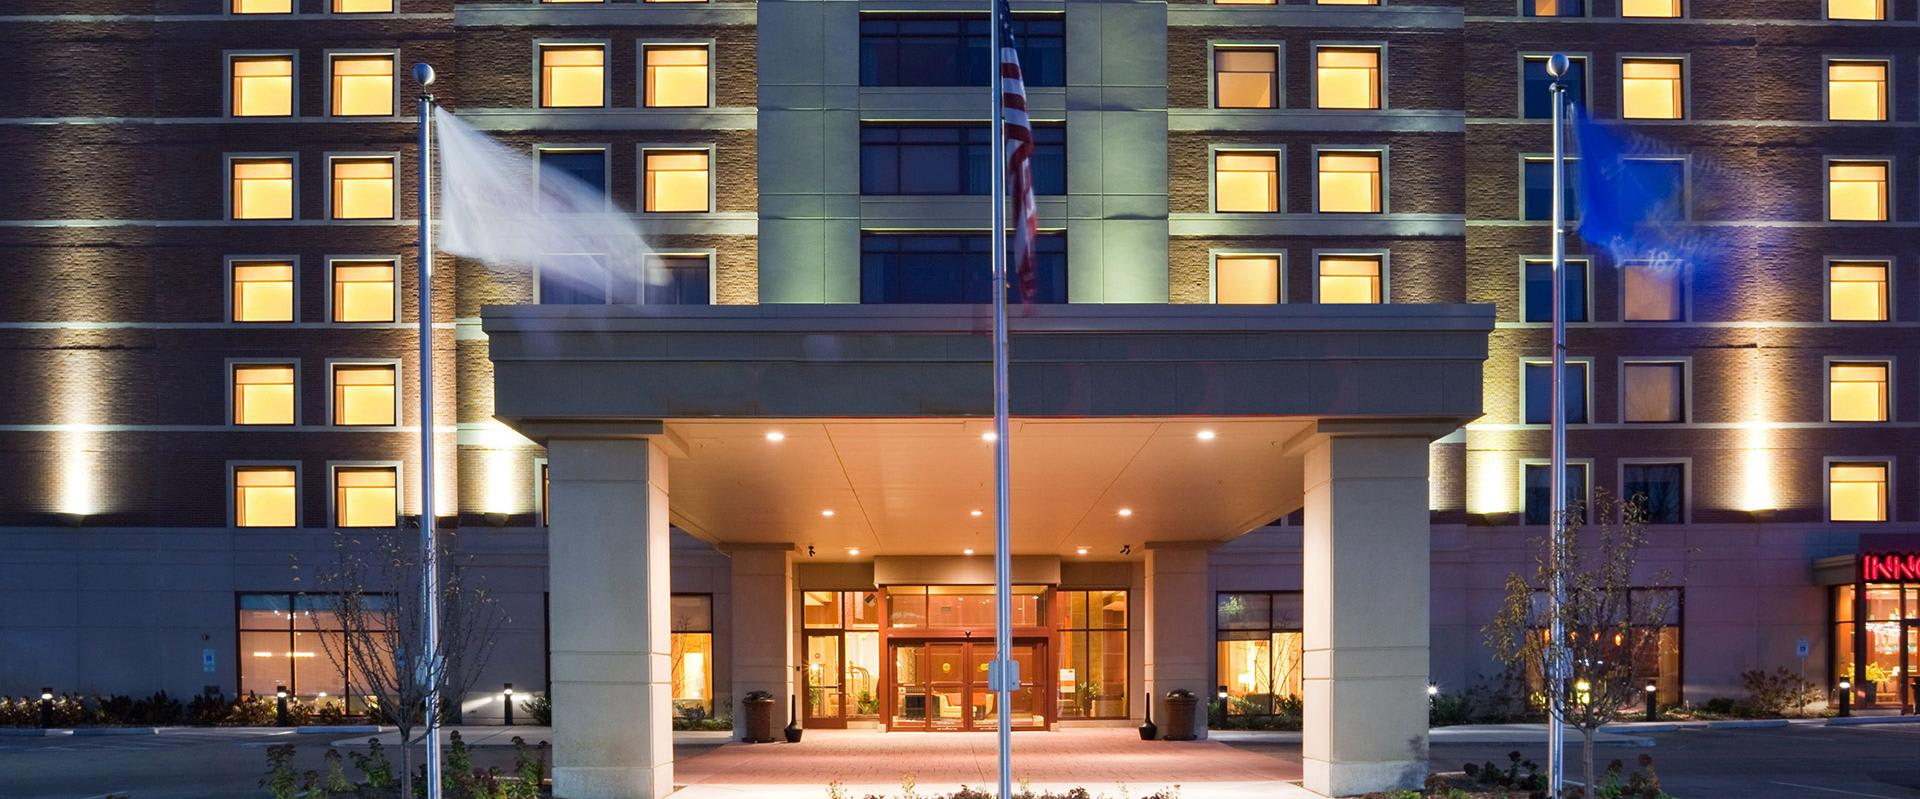 Milwaukee West Wauwatosa Hotel Exterior